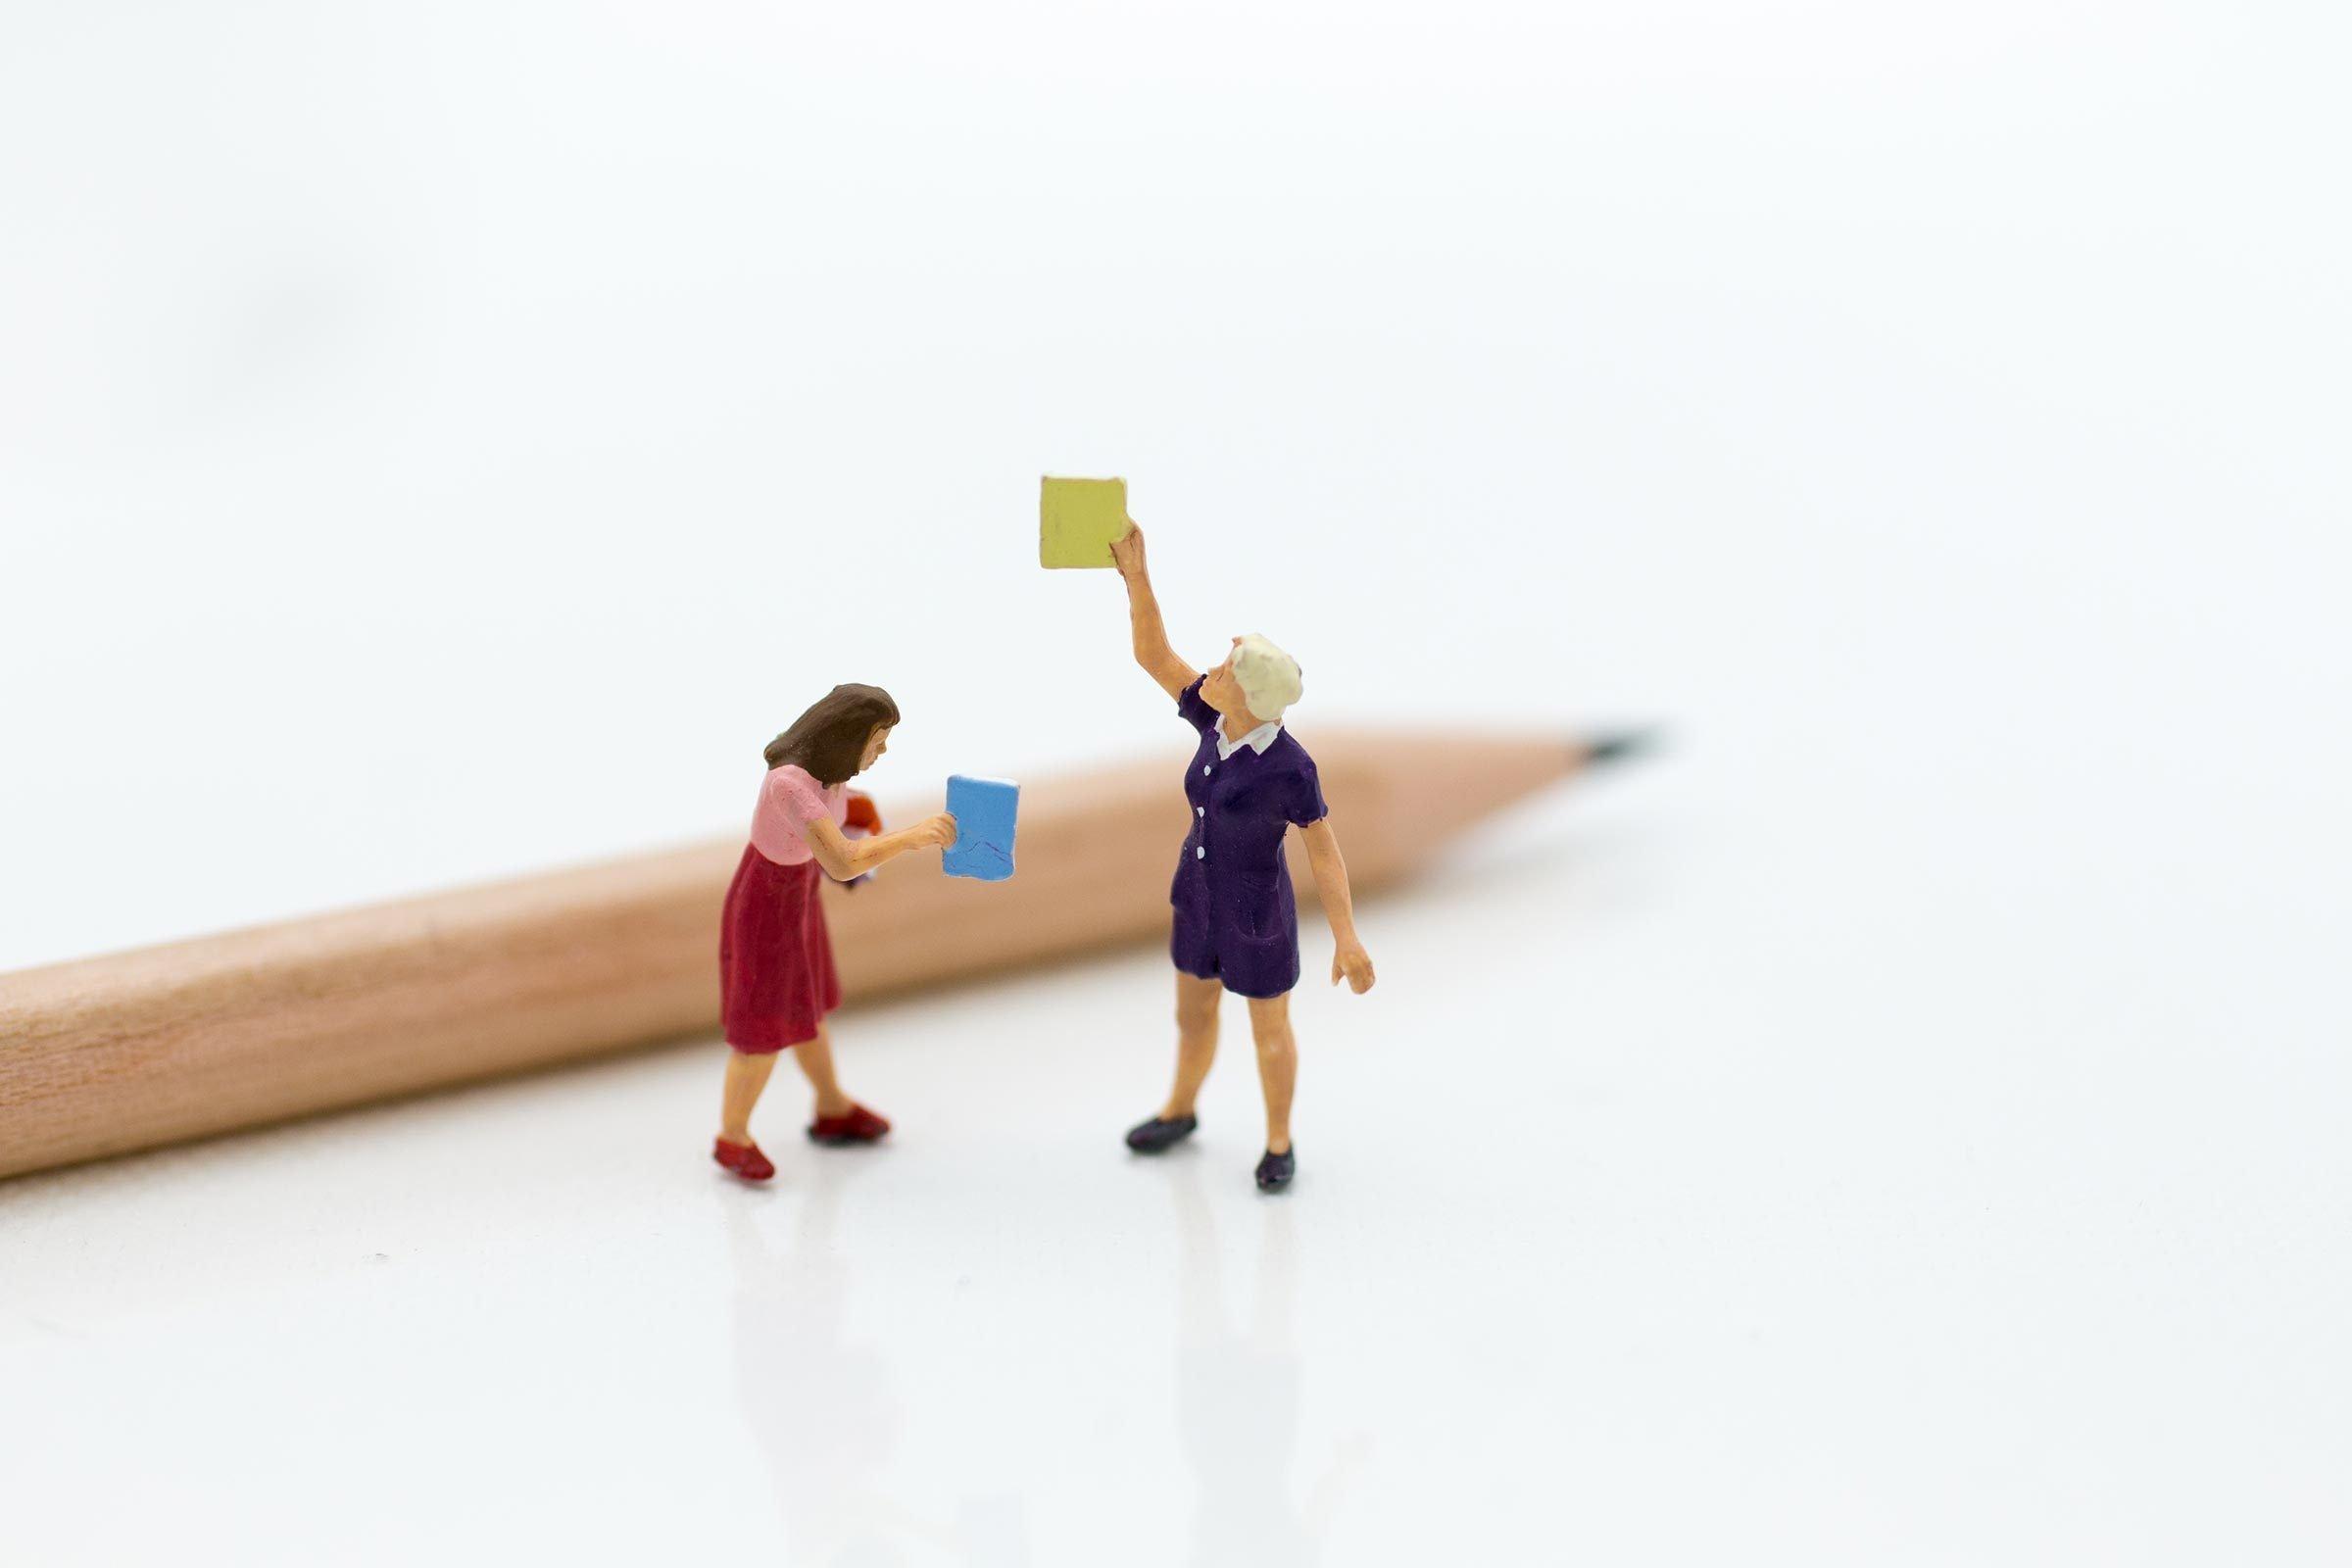 mini figures books pencil